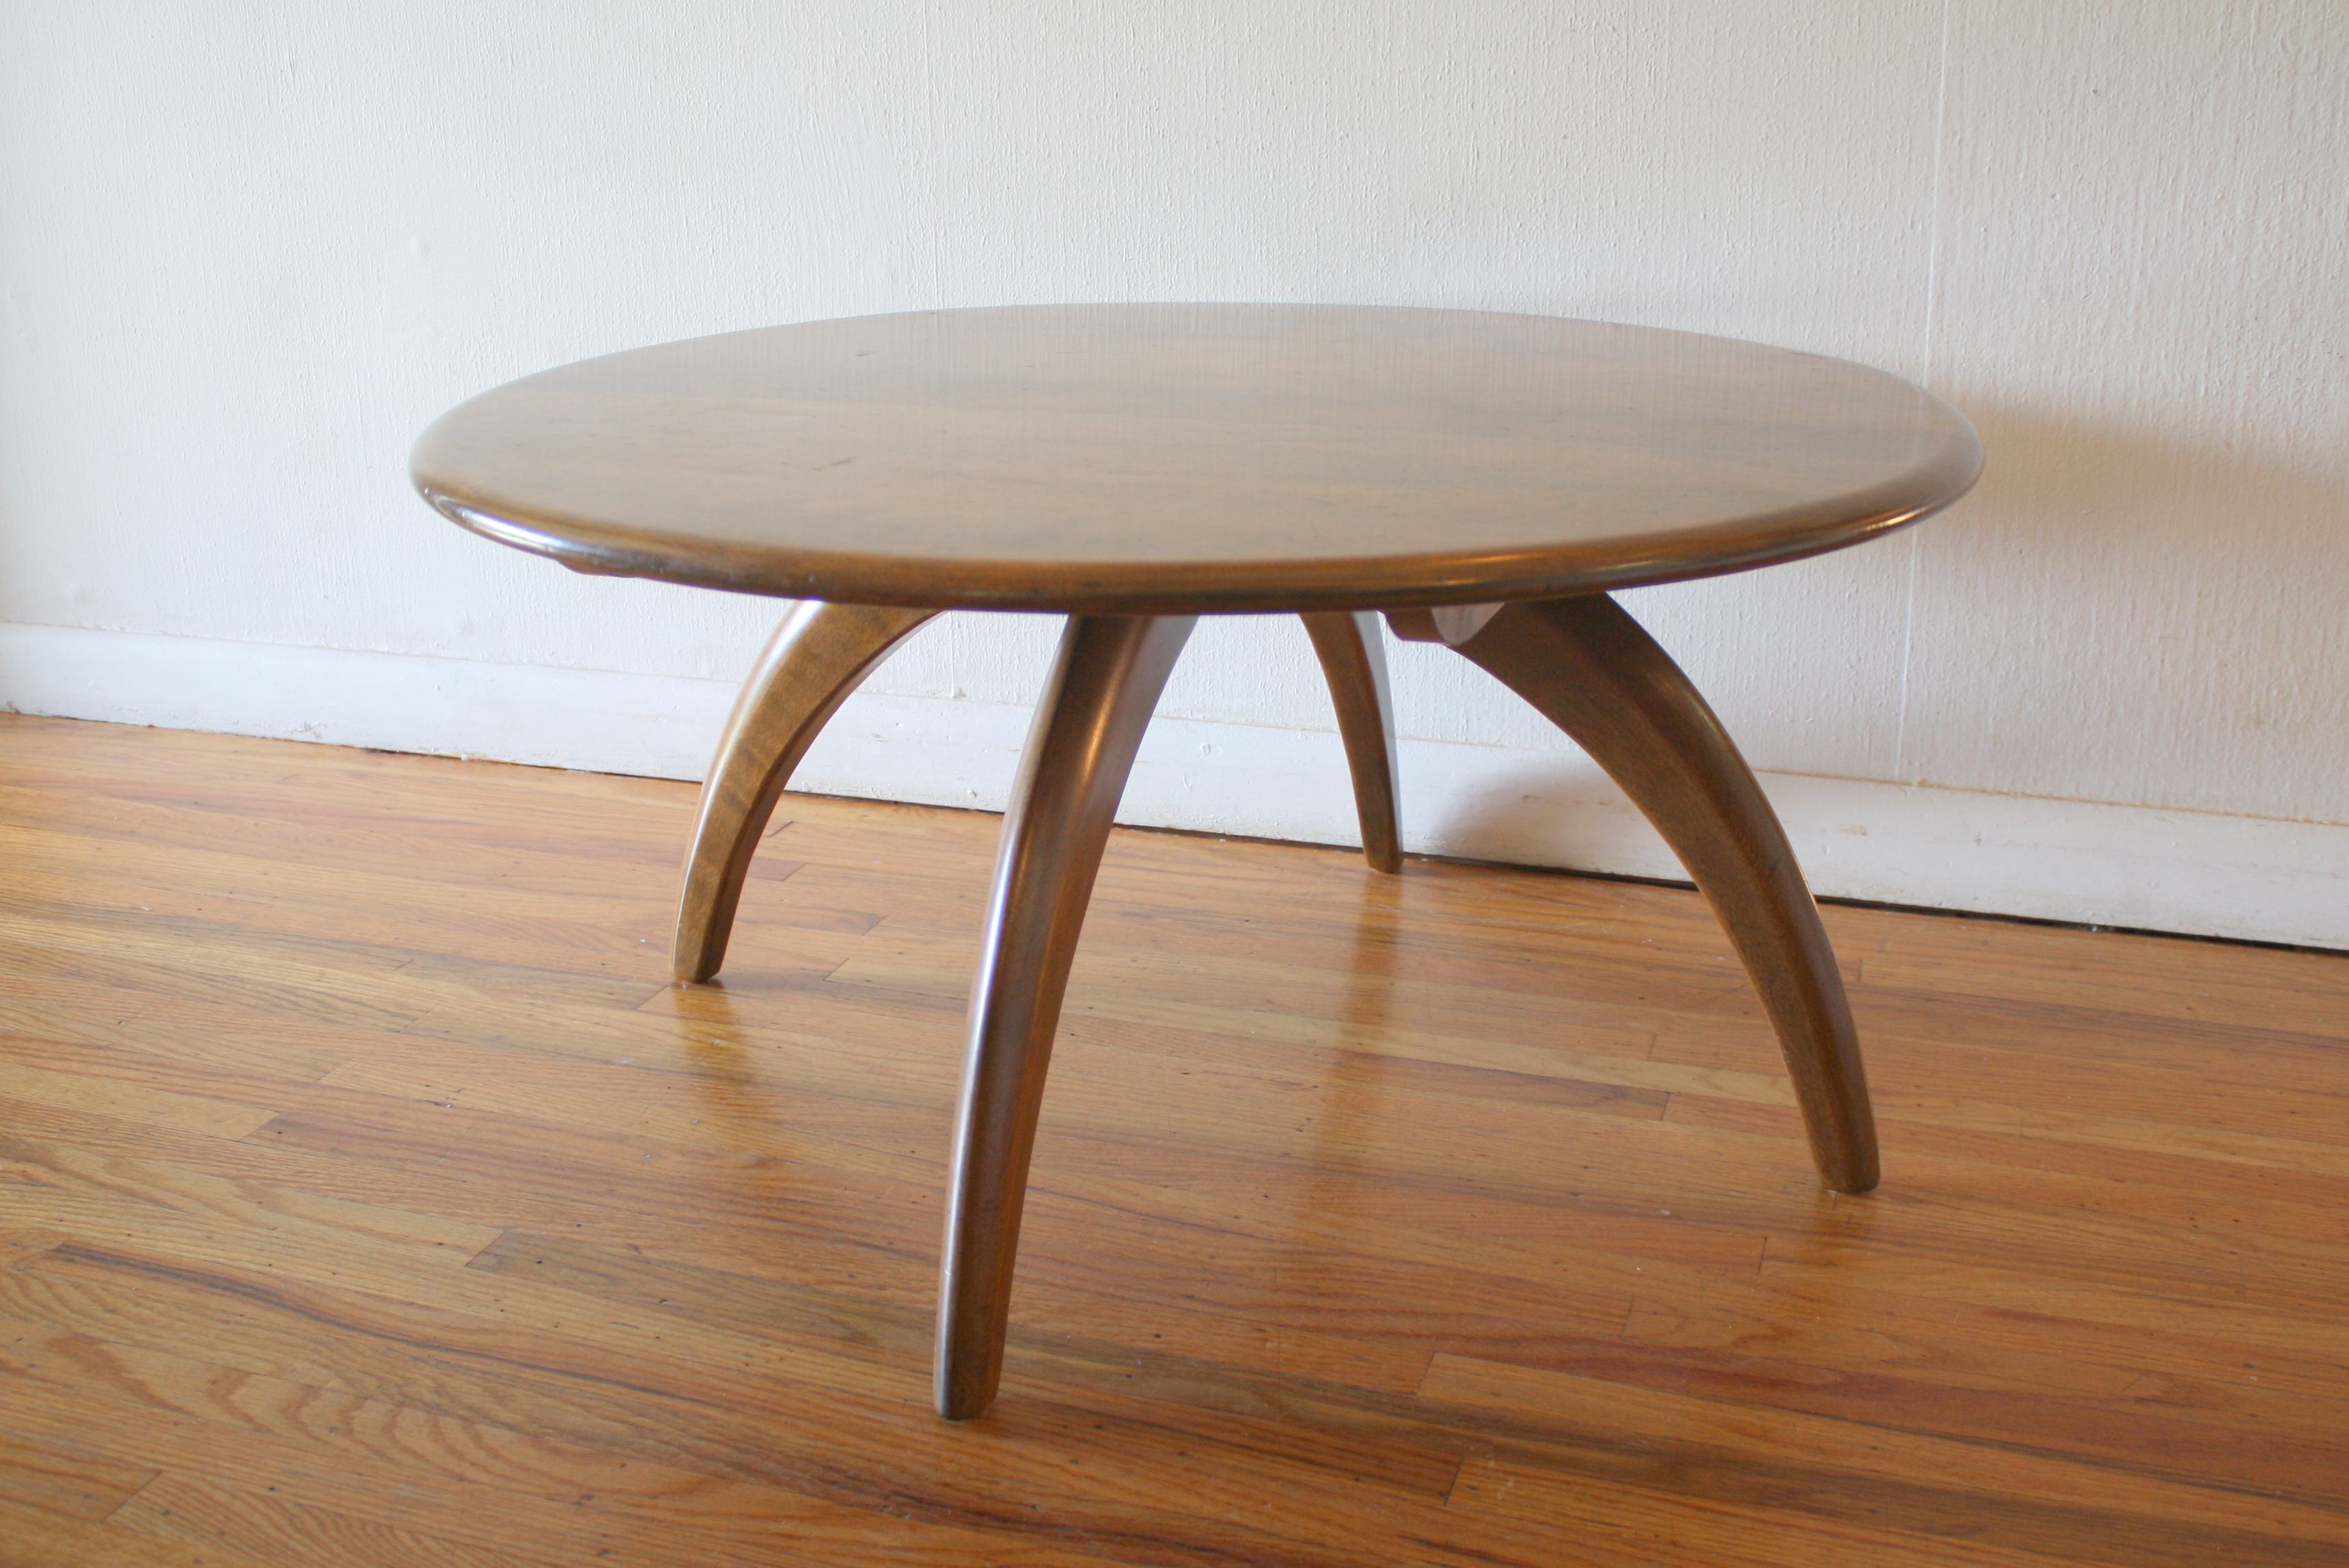 heywood-wakefield-round-coffee-table-1